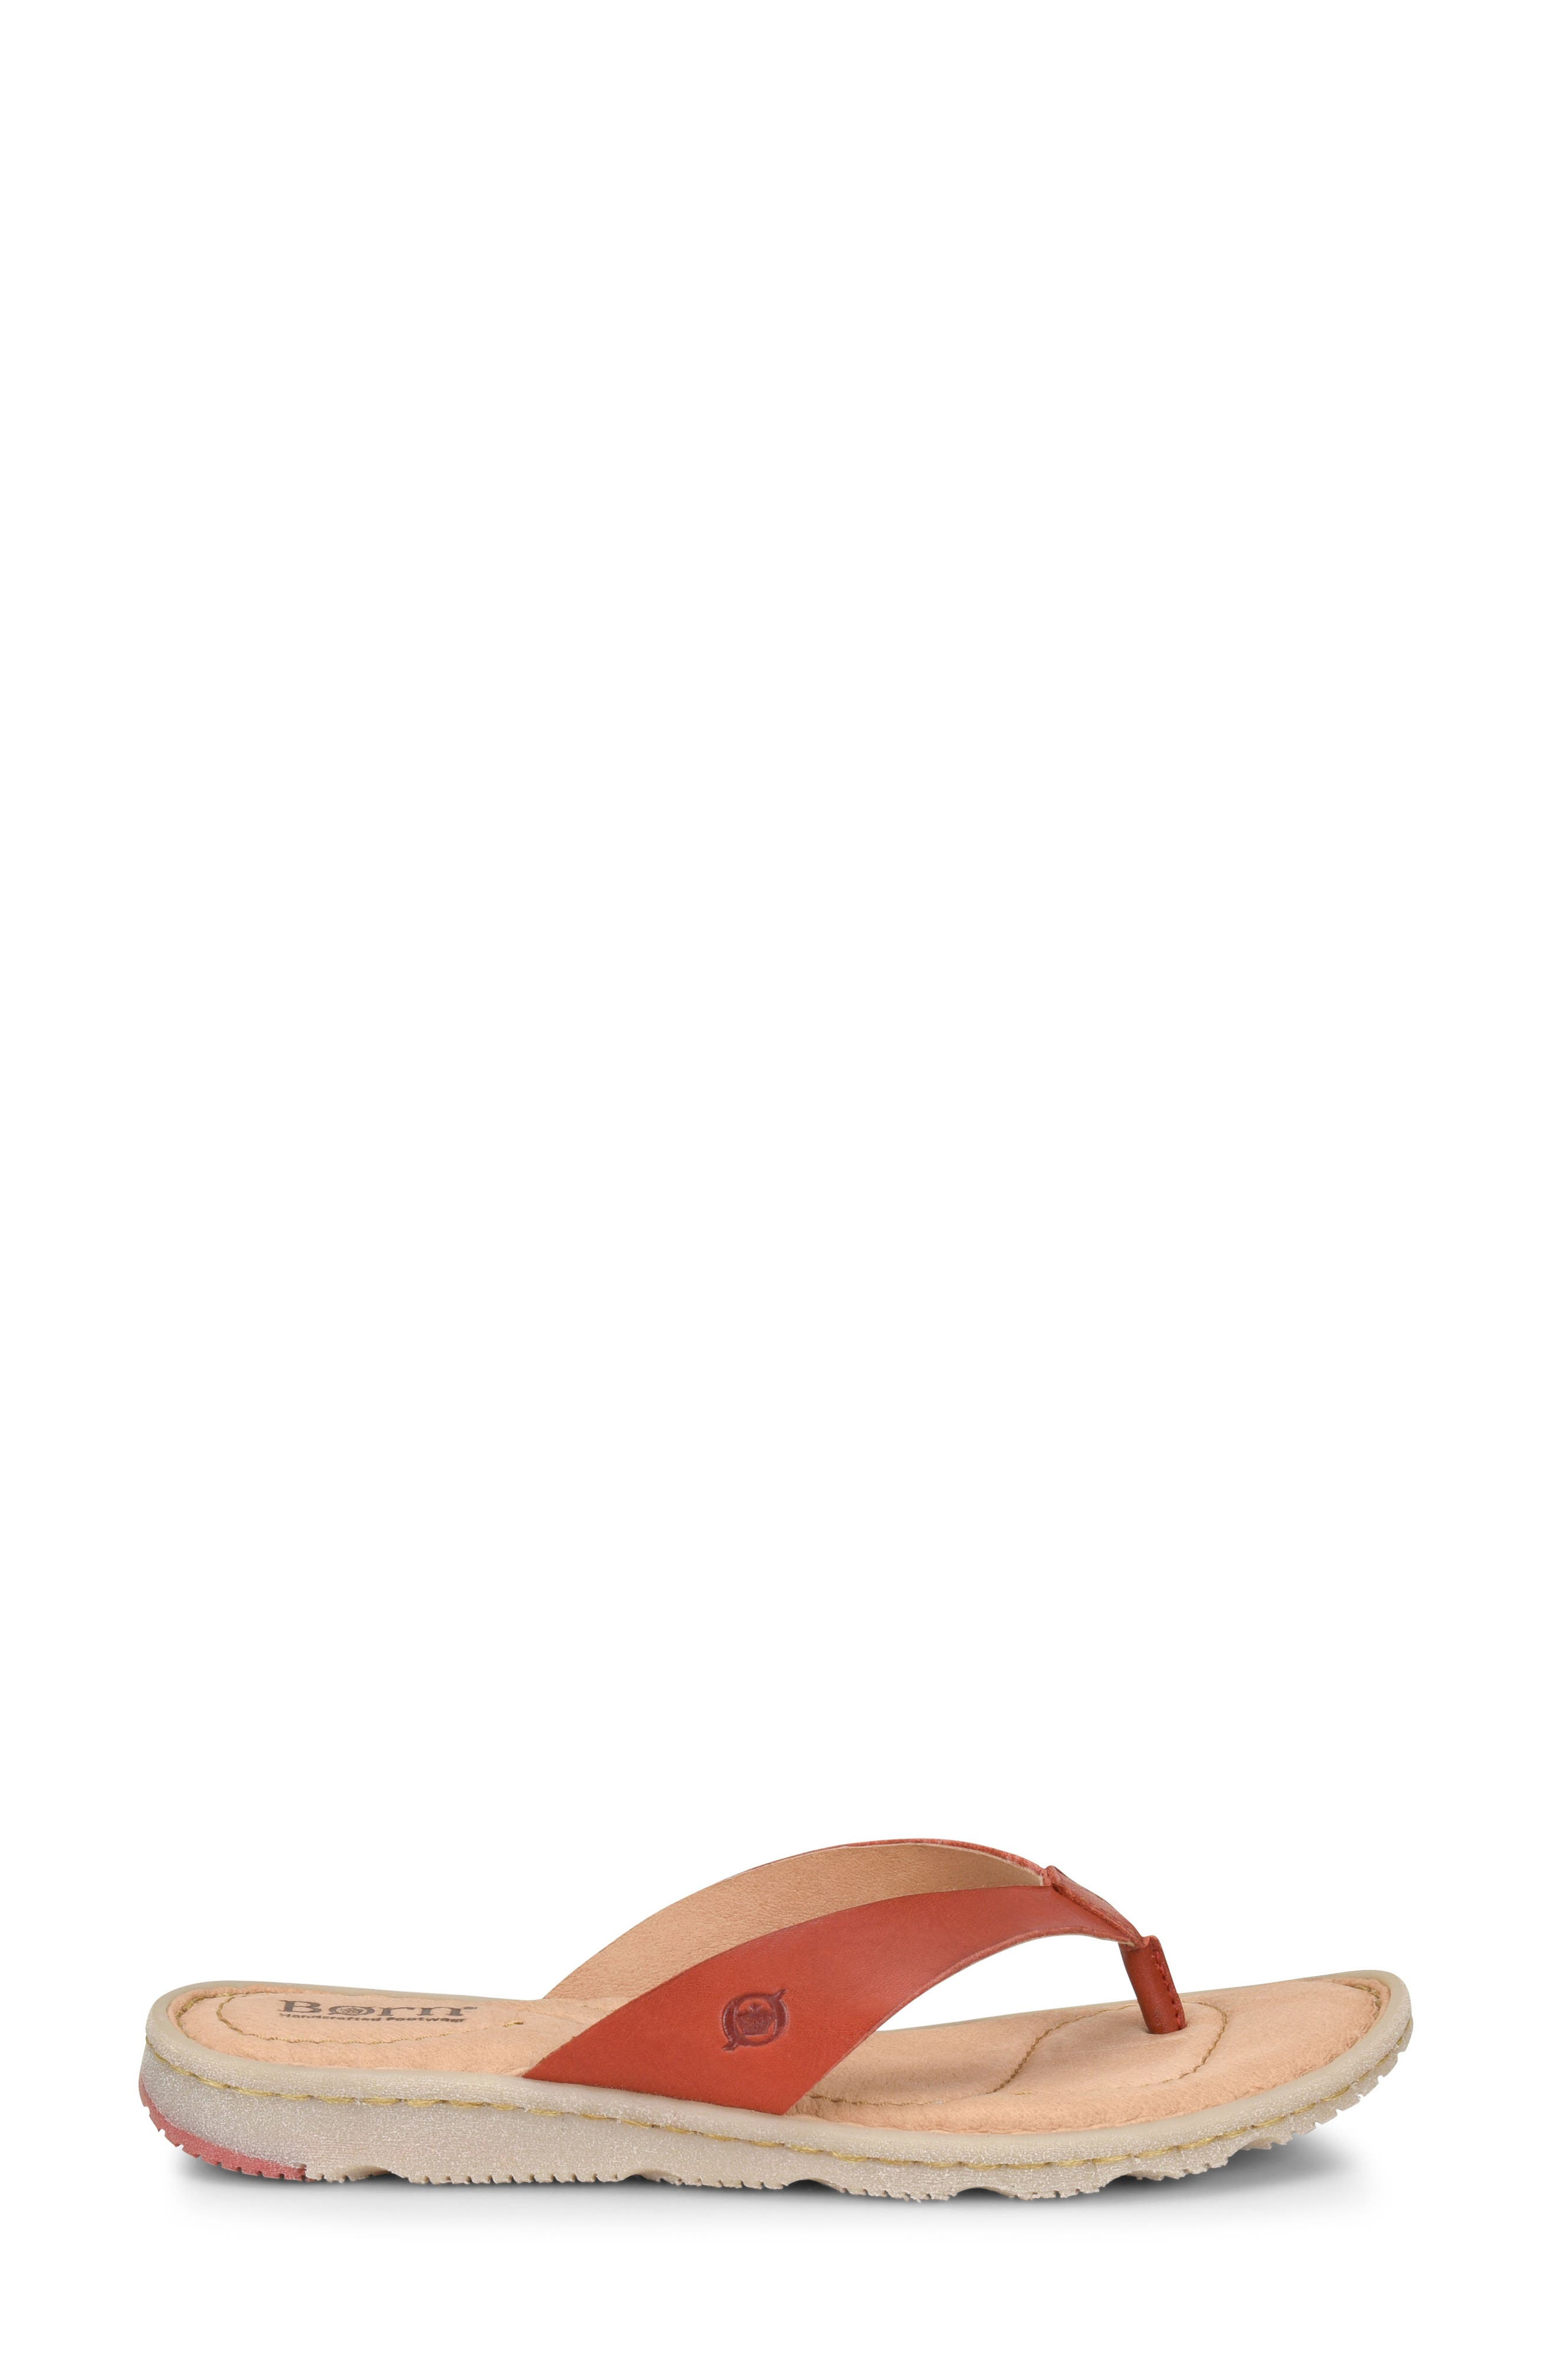 Tobago Flip Flop,                             Alternate thumbnail 9, color,